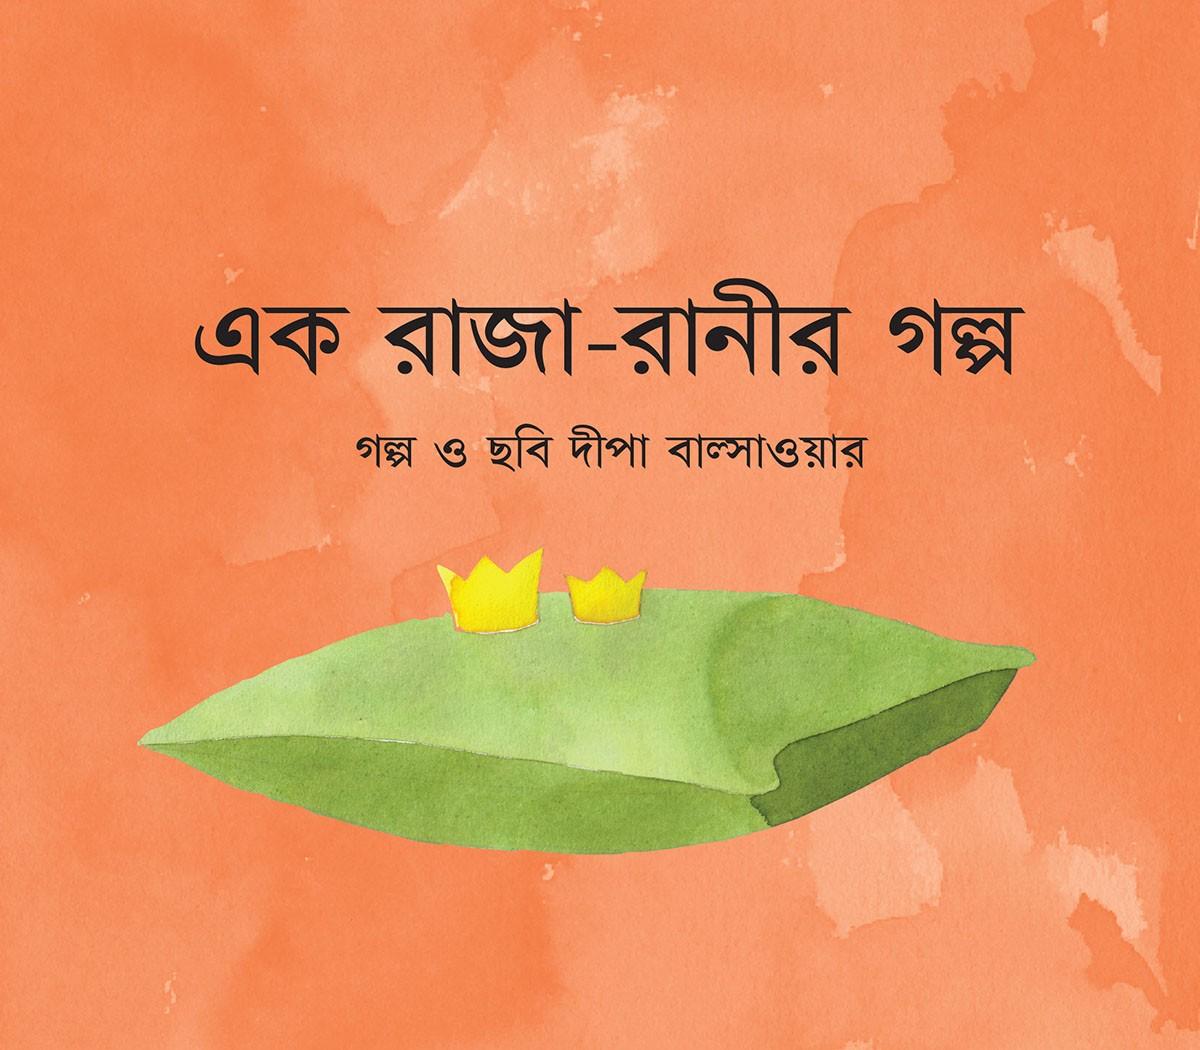 The Lonely King And Queen/Ek Raja-Ranir Golpo (Bengali)